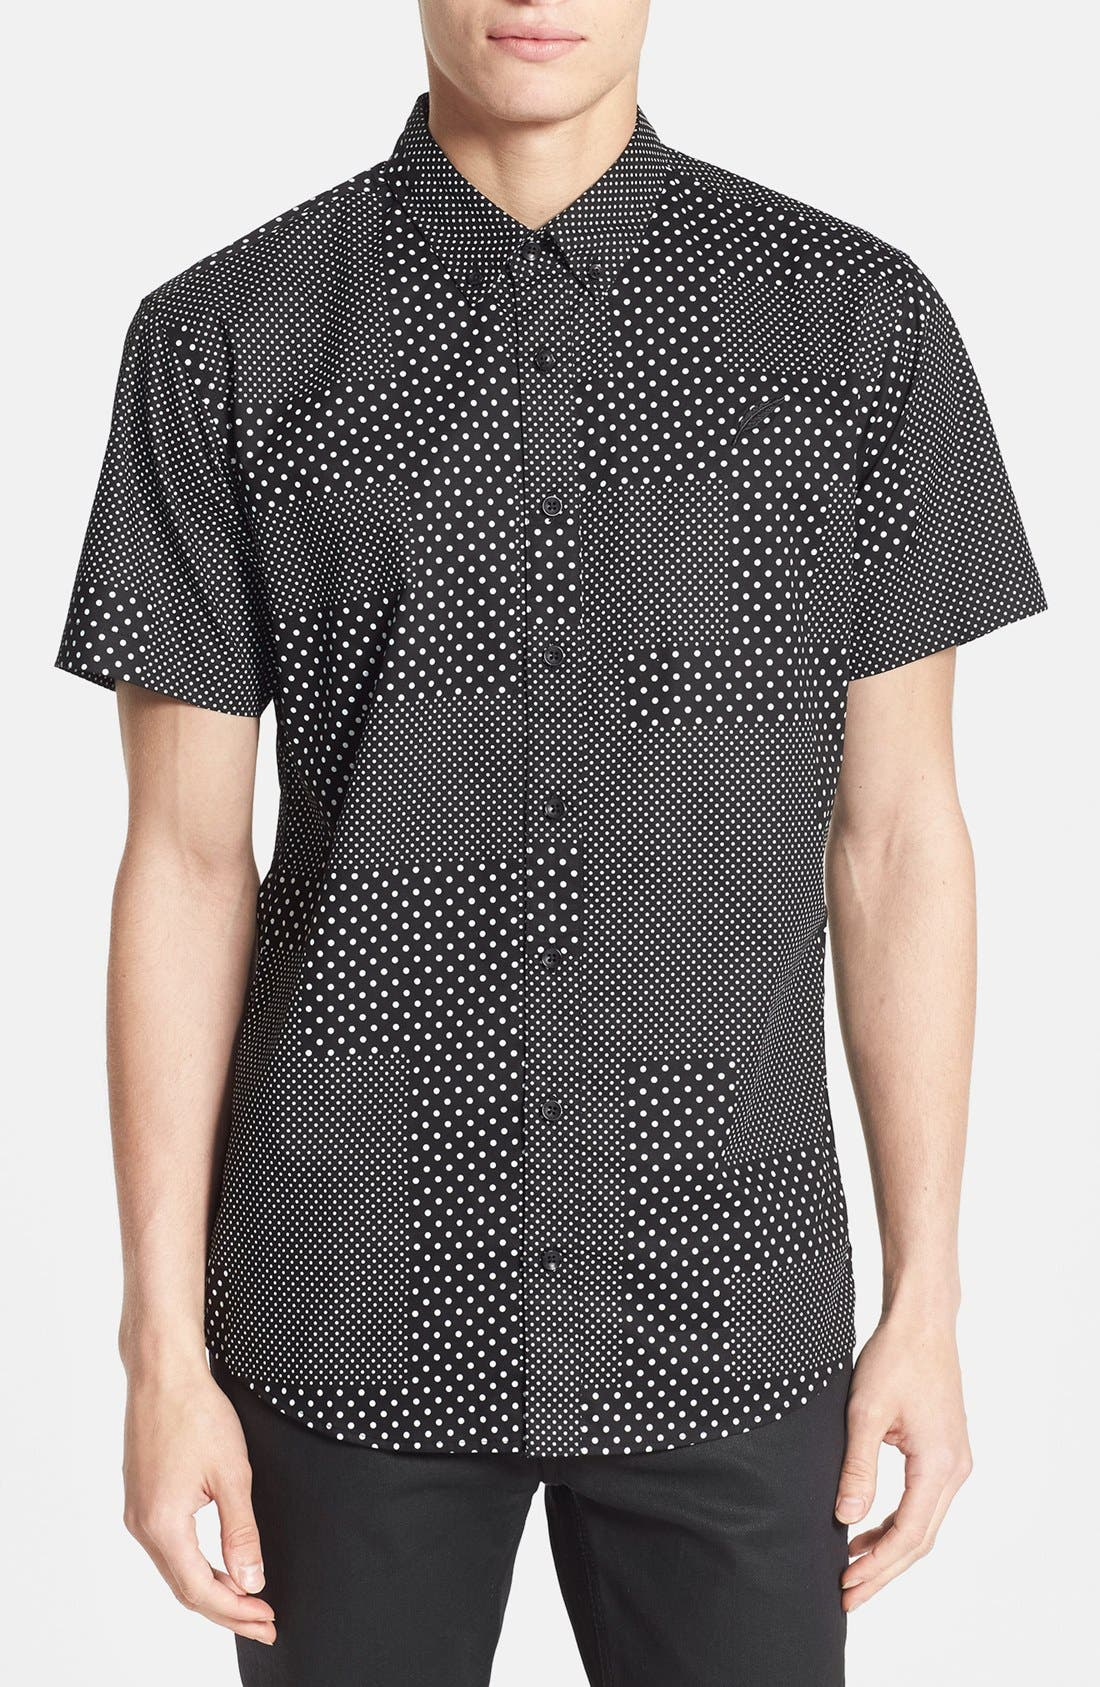 Alternate Image 1 Selected - PUBLISH BRAND 'Elias' Short Sleeve Dot Print Poplin Shirt